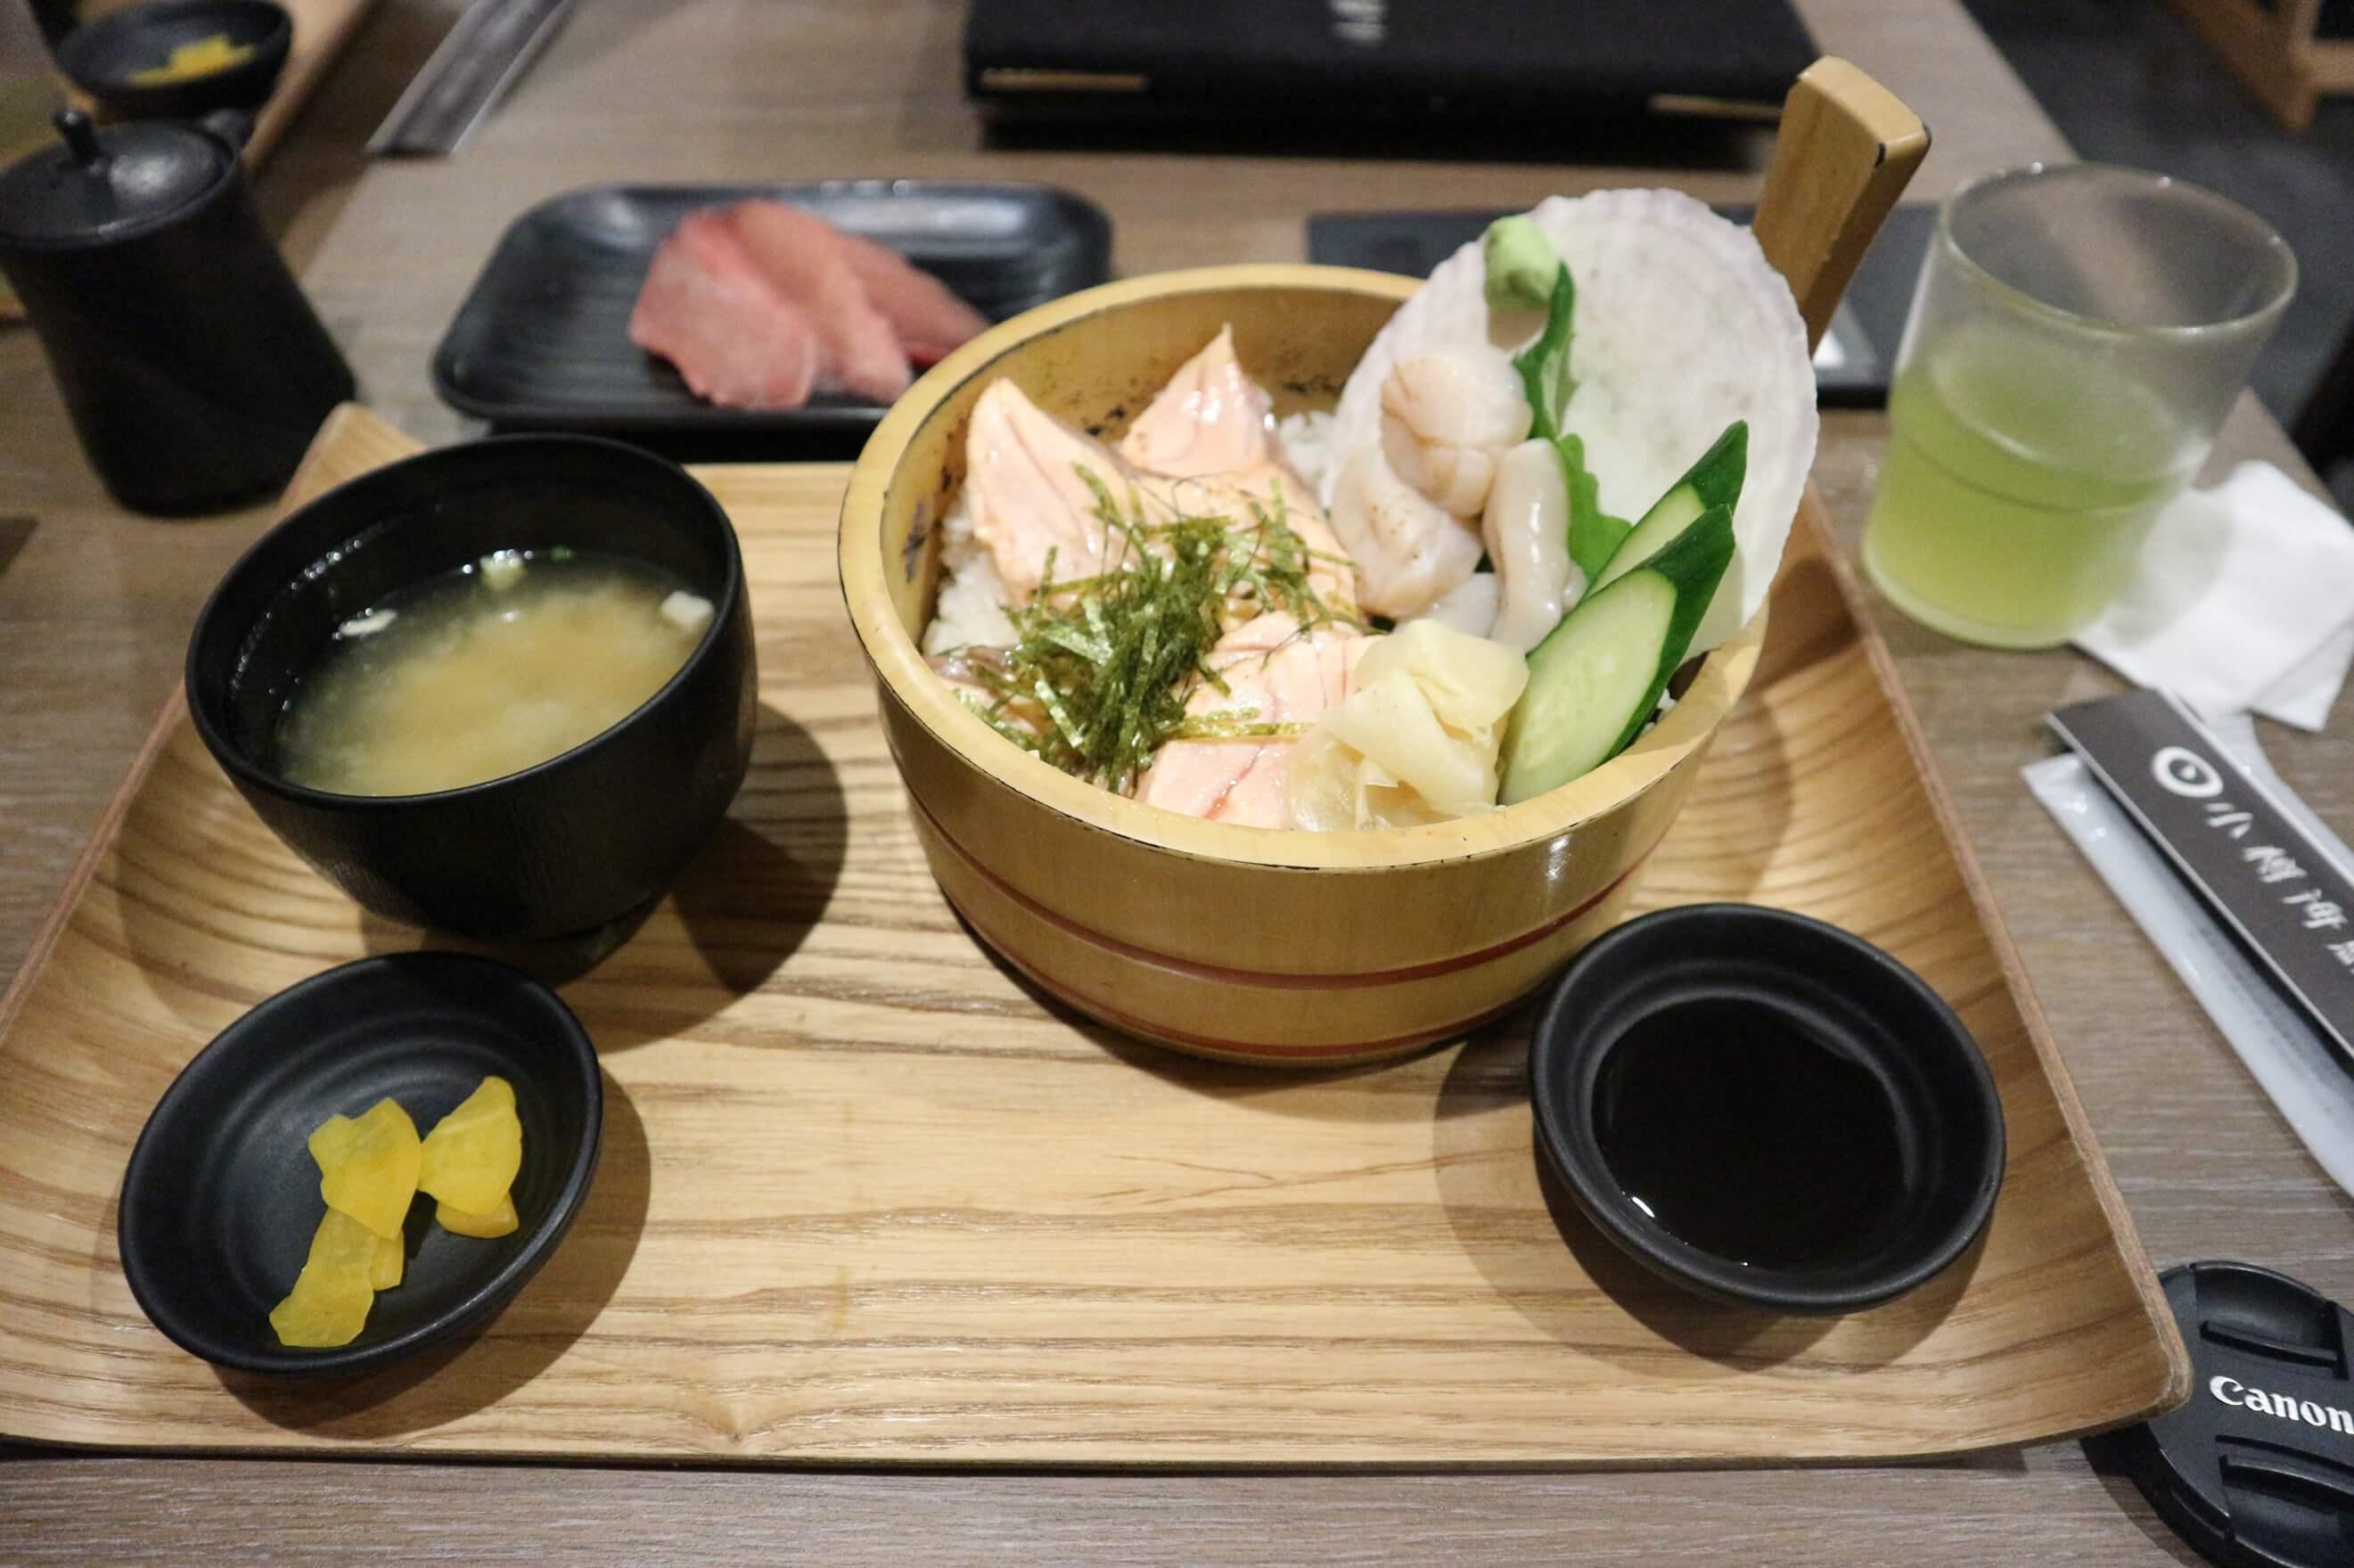 donburi - kuzey japonya gezi rehberi - hokkaido yemekler